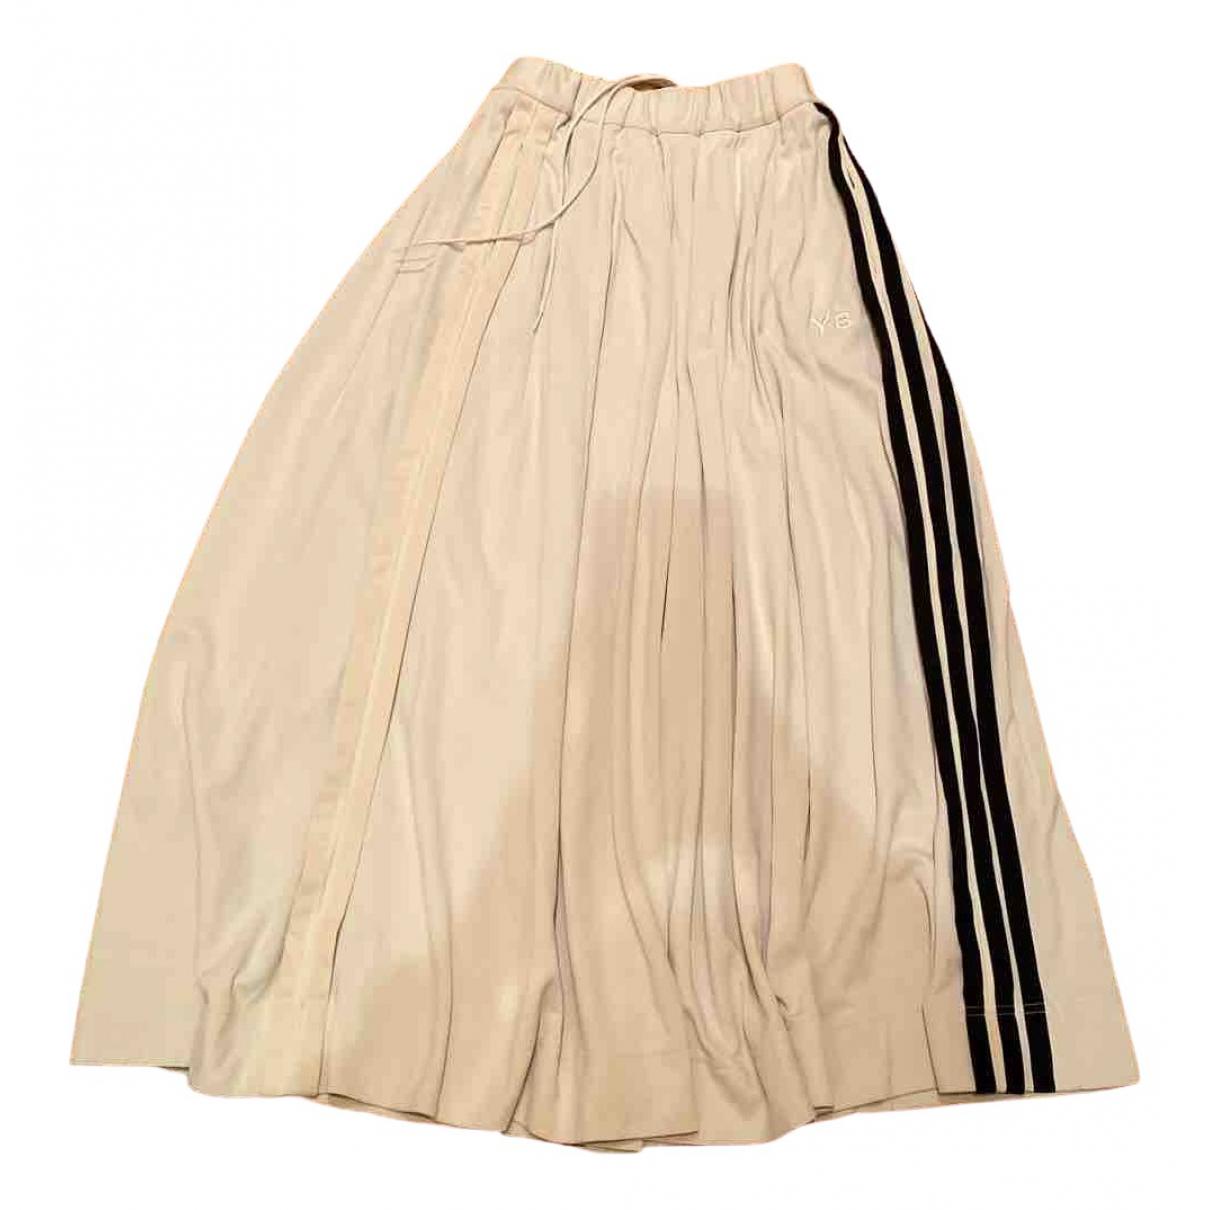 Y-3 By Yohji Yamamoto \N White Cotton skirt for Women 38 FR